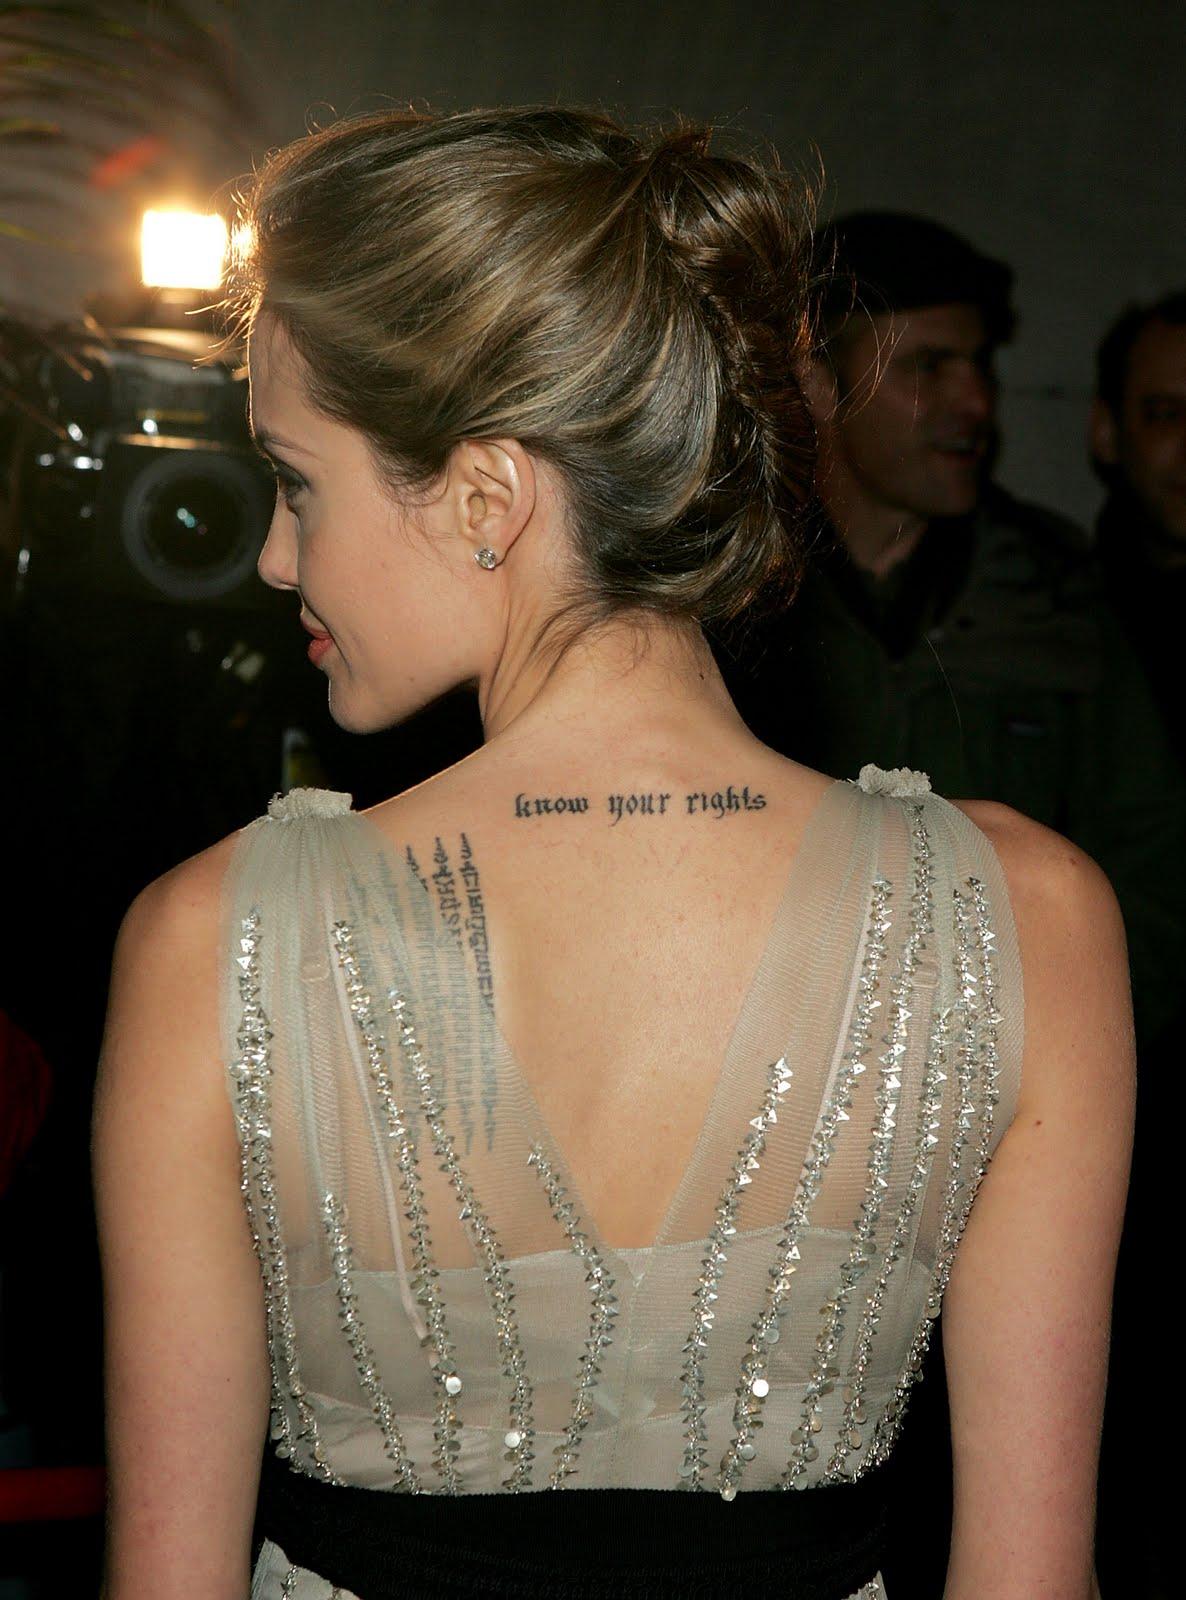 Bloodybridge Back Neck Tattoos Designs For Girls